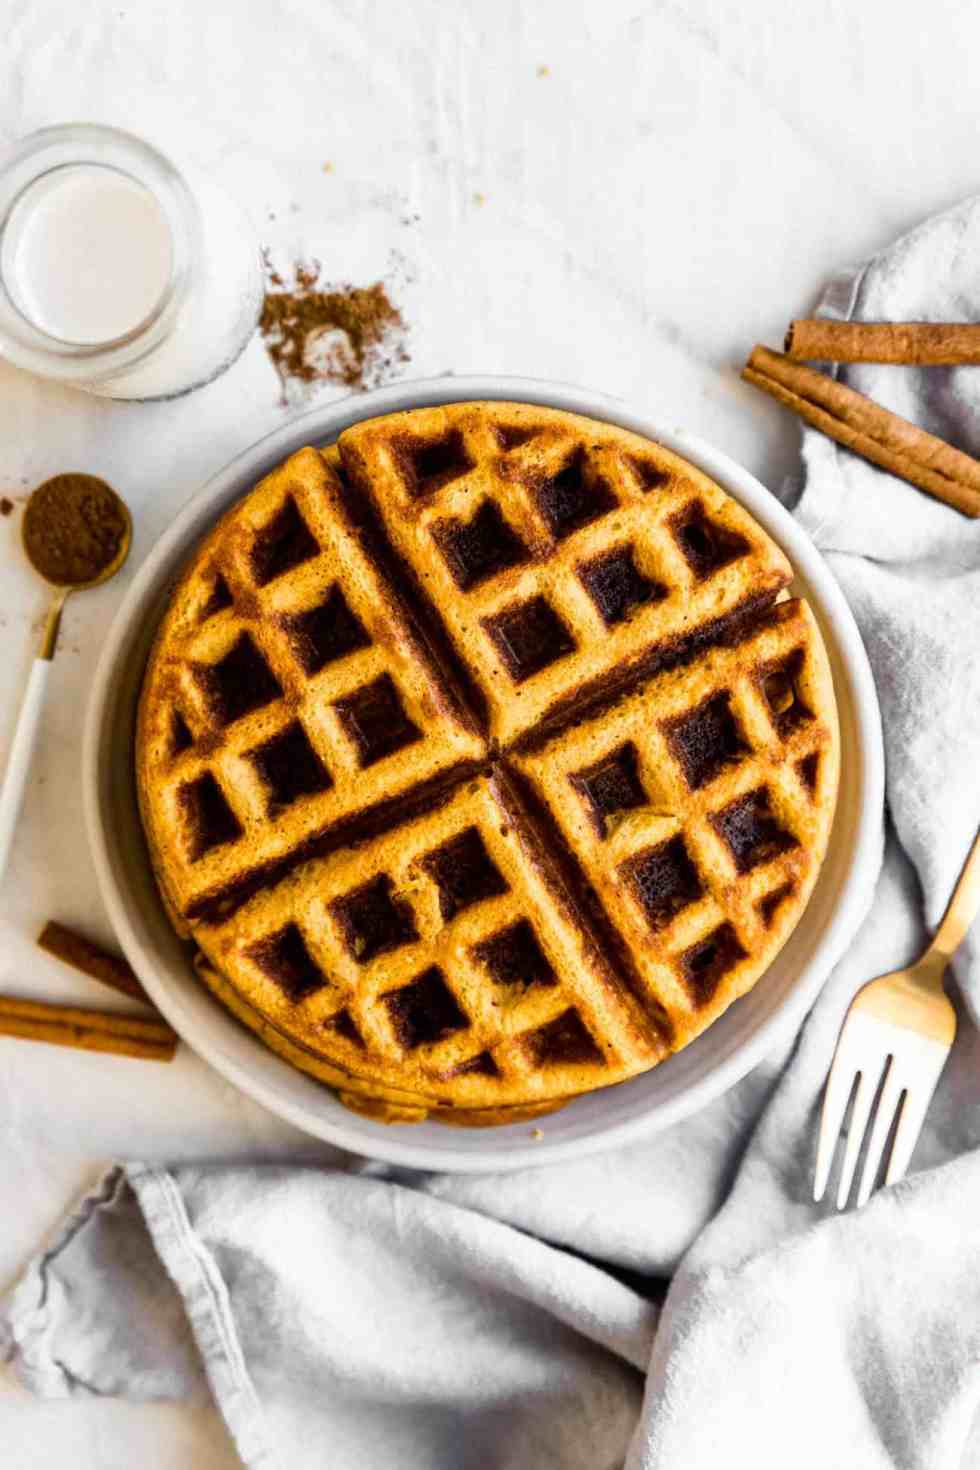 paleo pumpkin waffles stacked on a plate